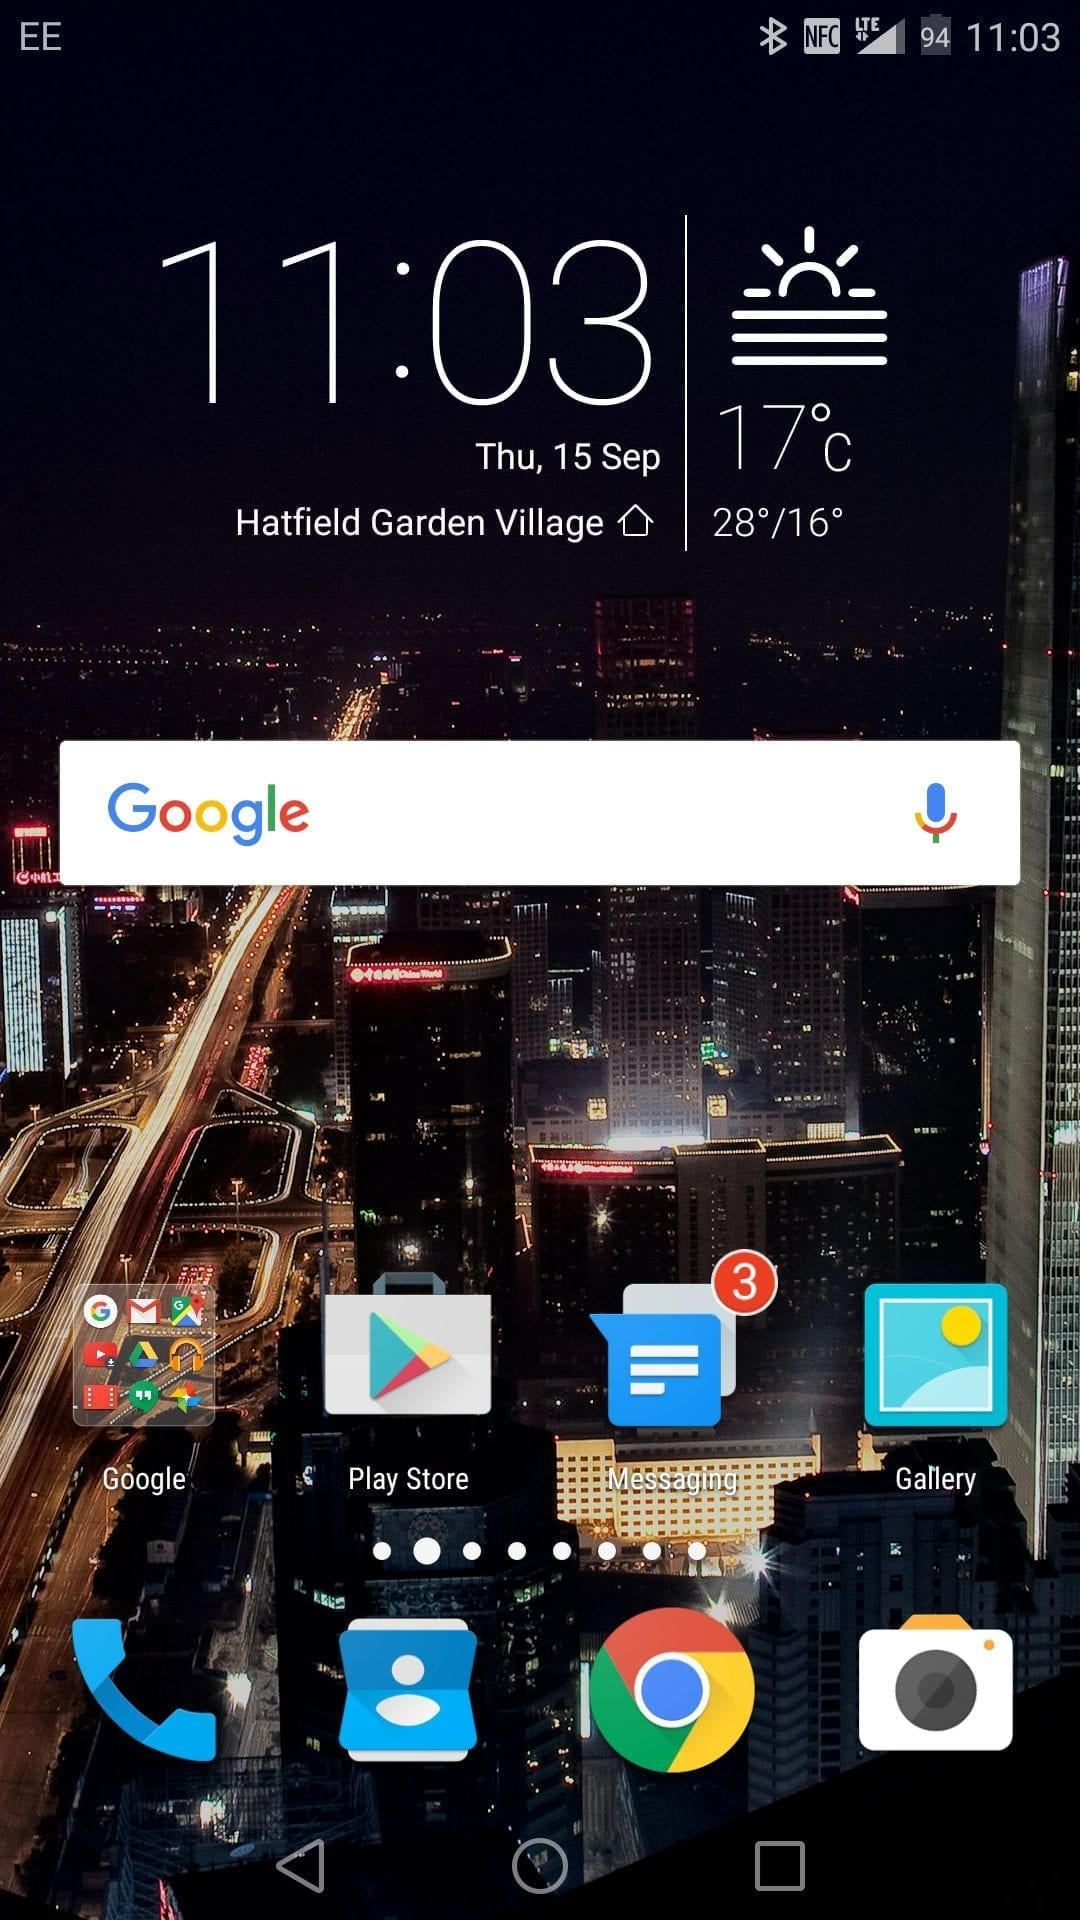 screenshot_2016-09-15-11-03-44.png